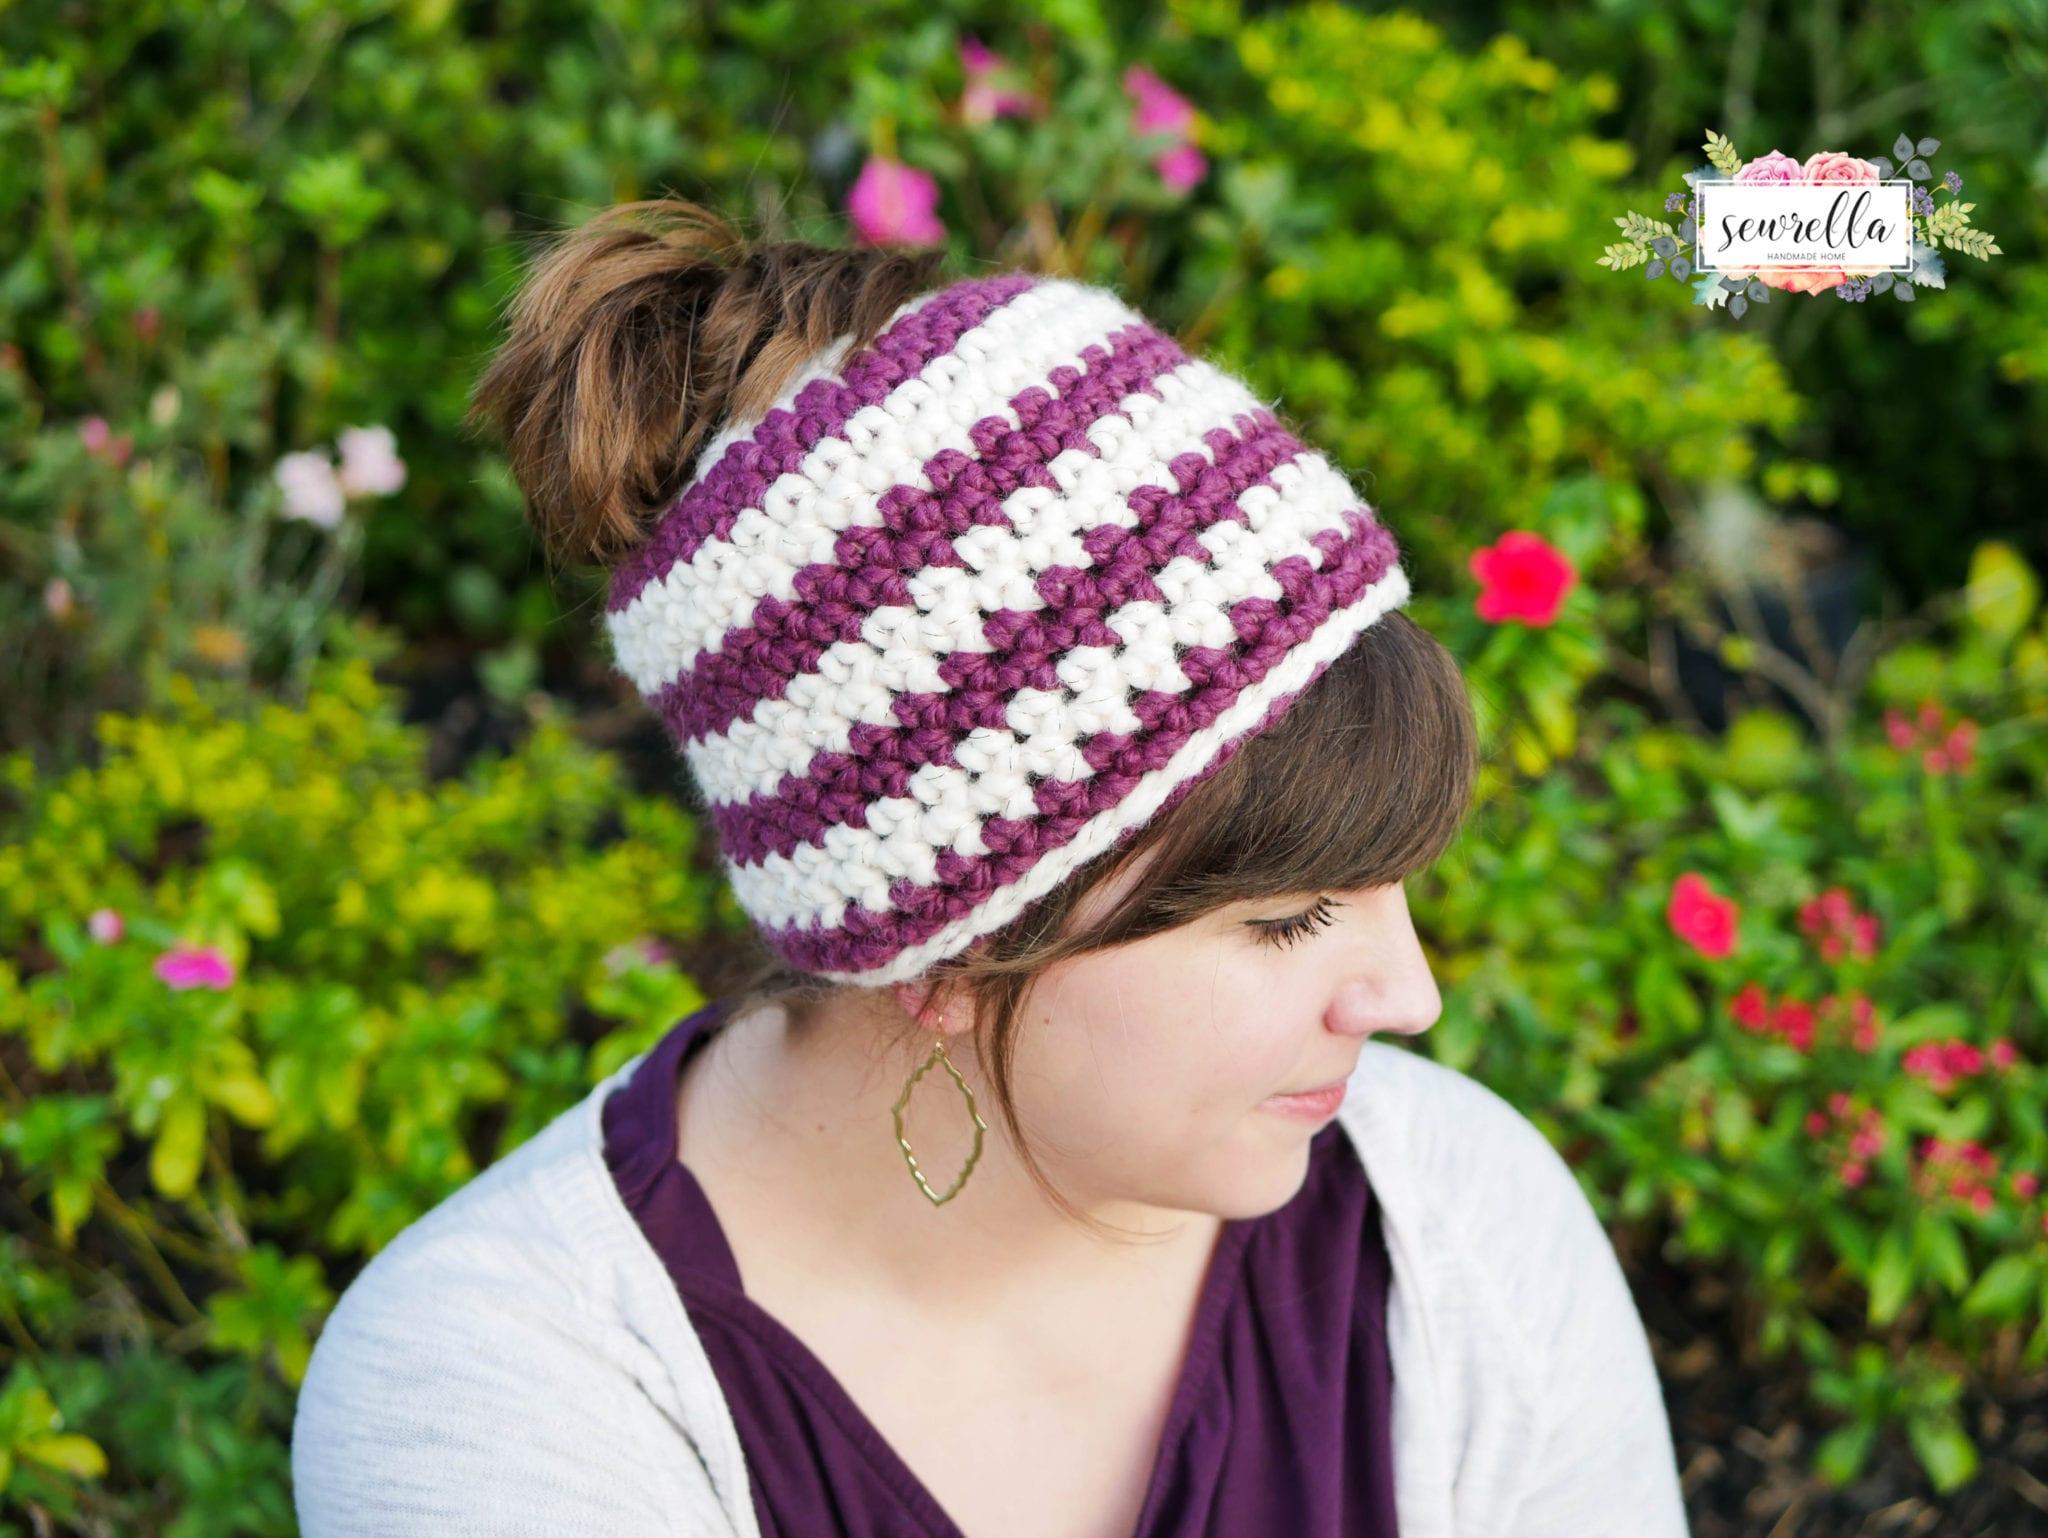 Crochet 1 hour Messy Bun Beanie - Sewrella e66f9e0298f9